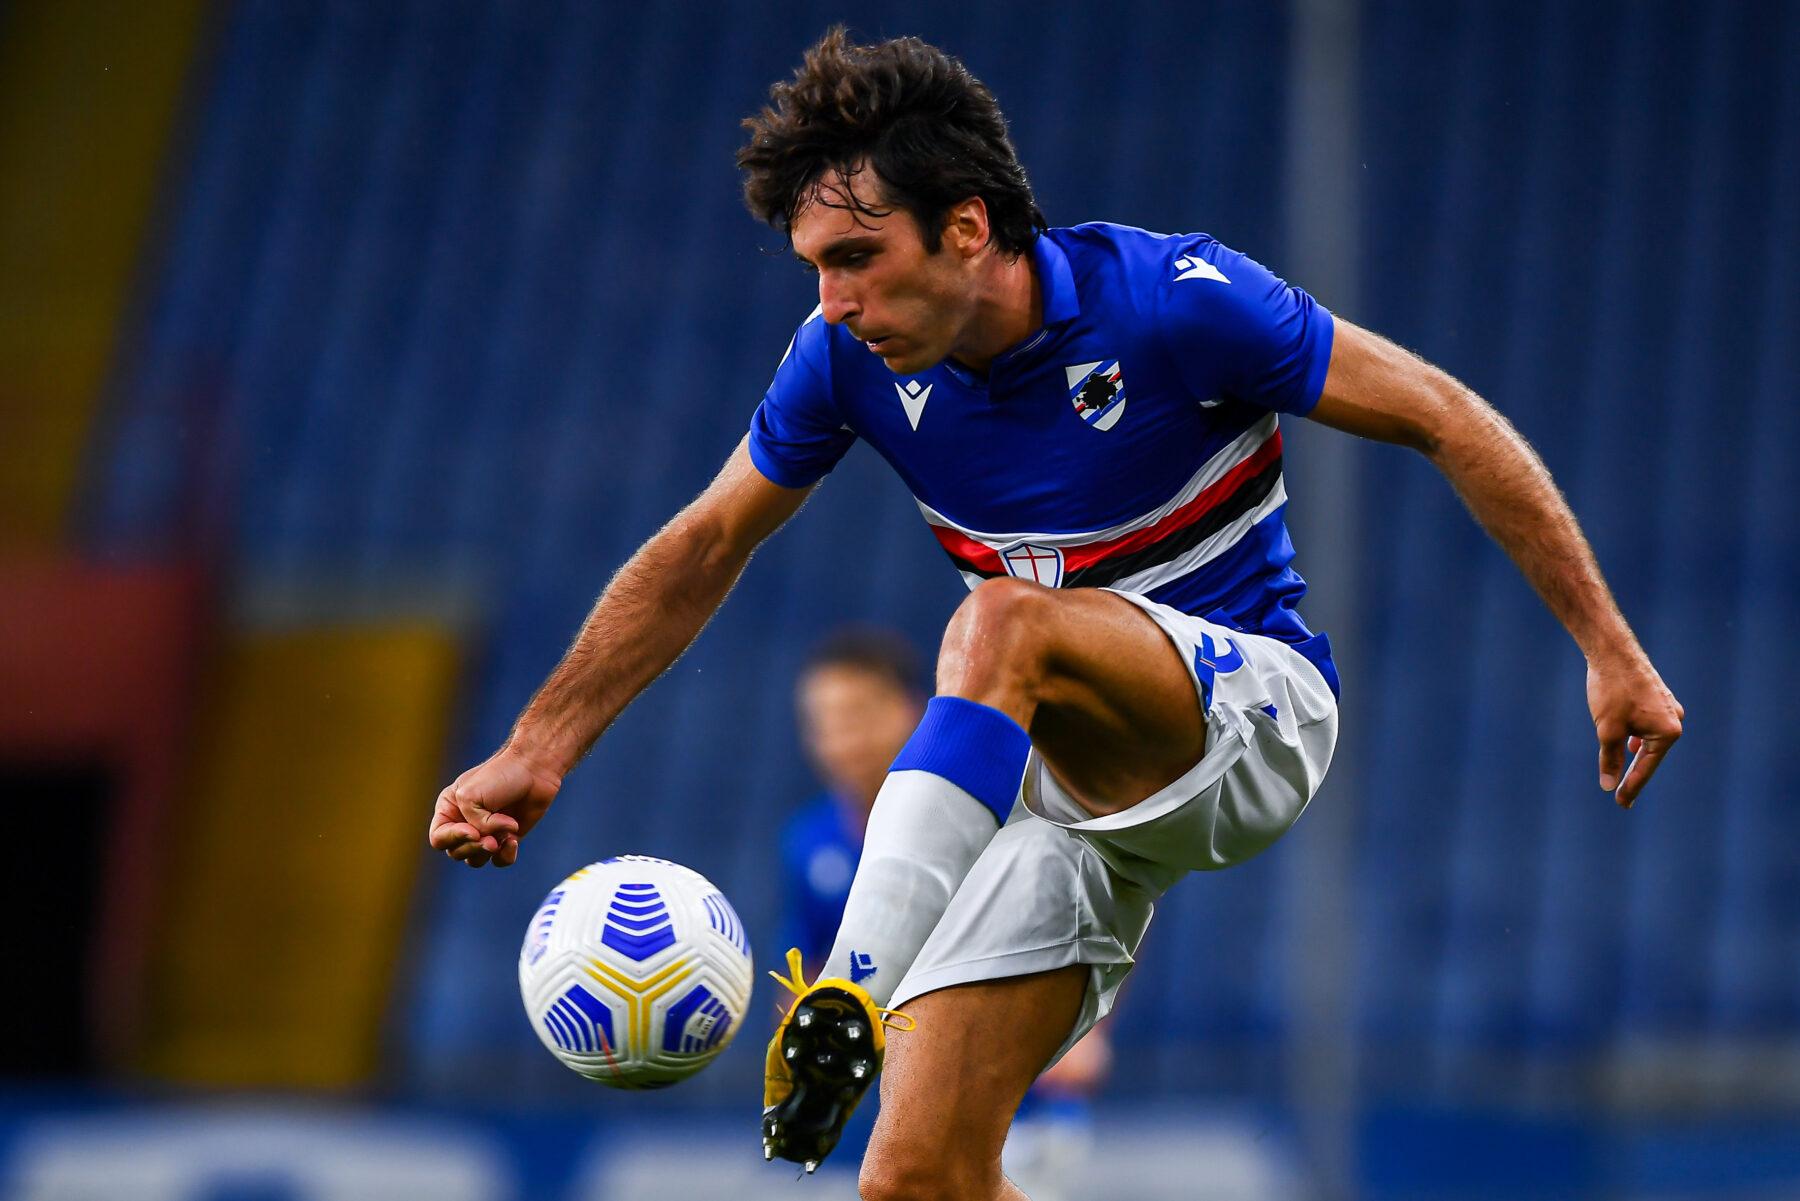 Augello - Credit foto Sampdoria: UcSampdoria/Pegaso